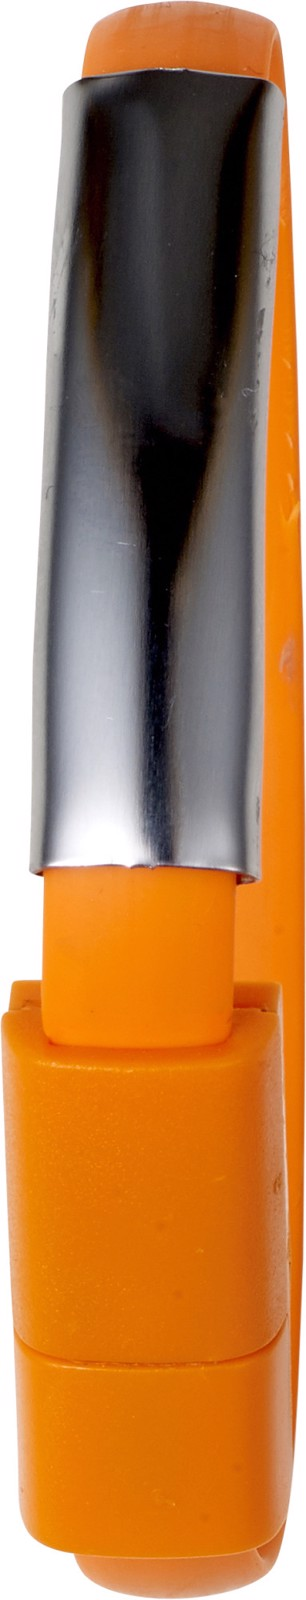 Silicone wristband - Orange